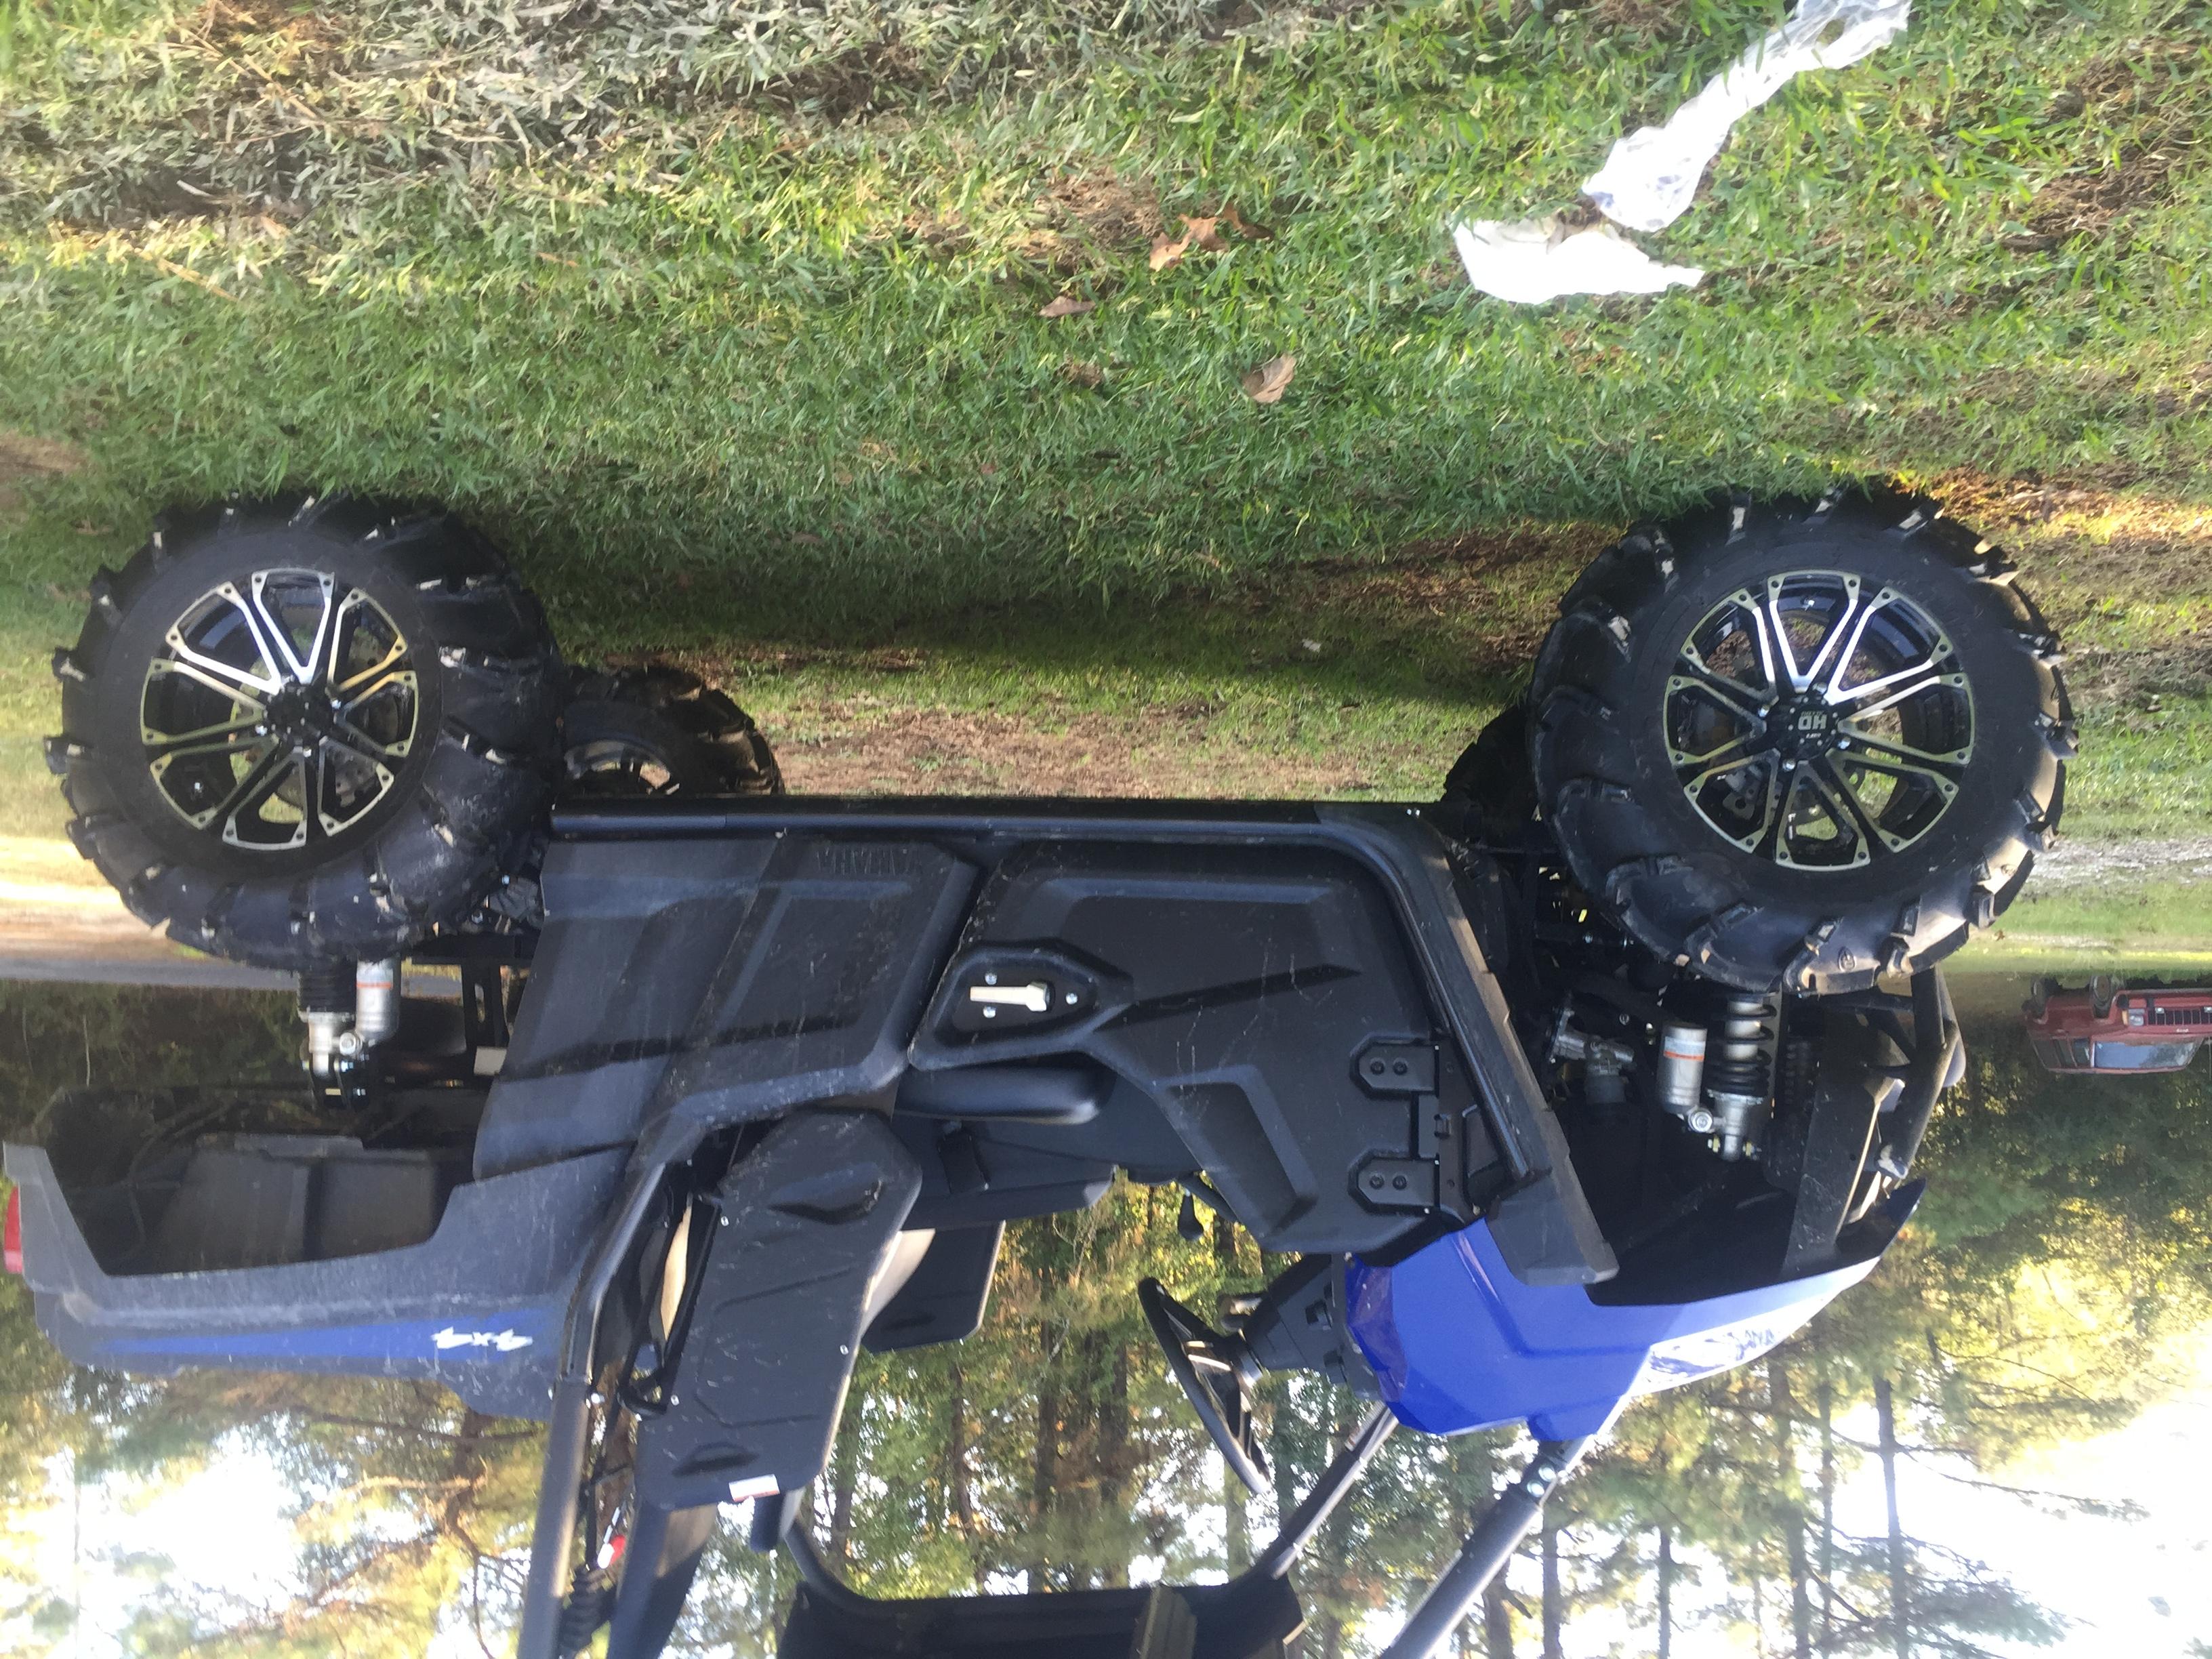 Yamaha Wolverine R Spec Eps 2016 High Lifter Upcomingcarshq Com